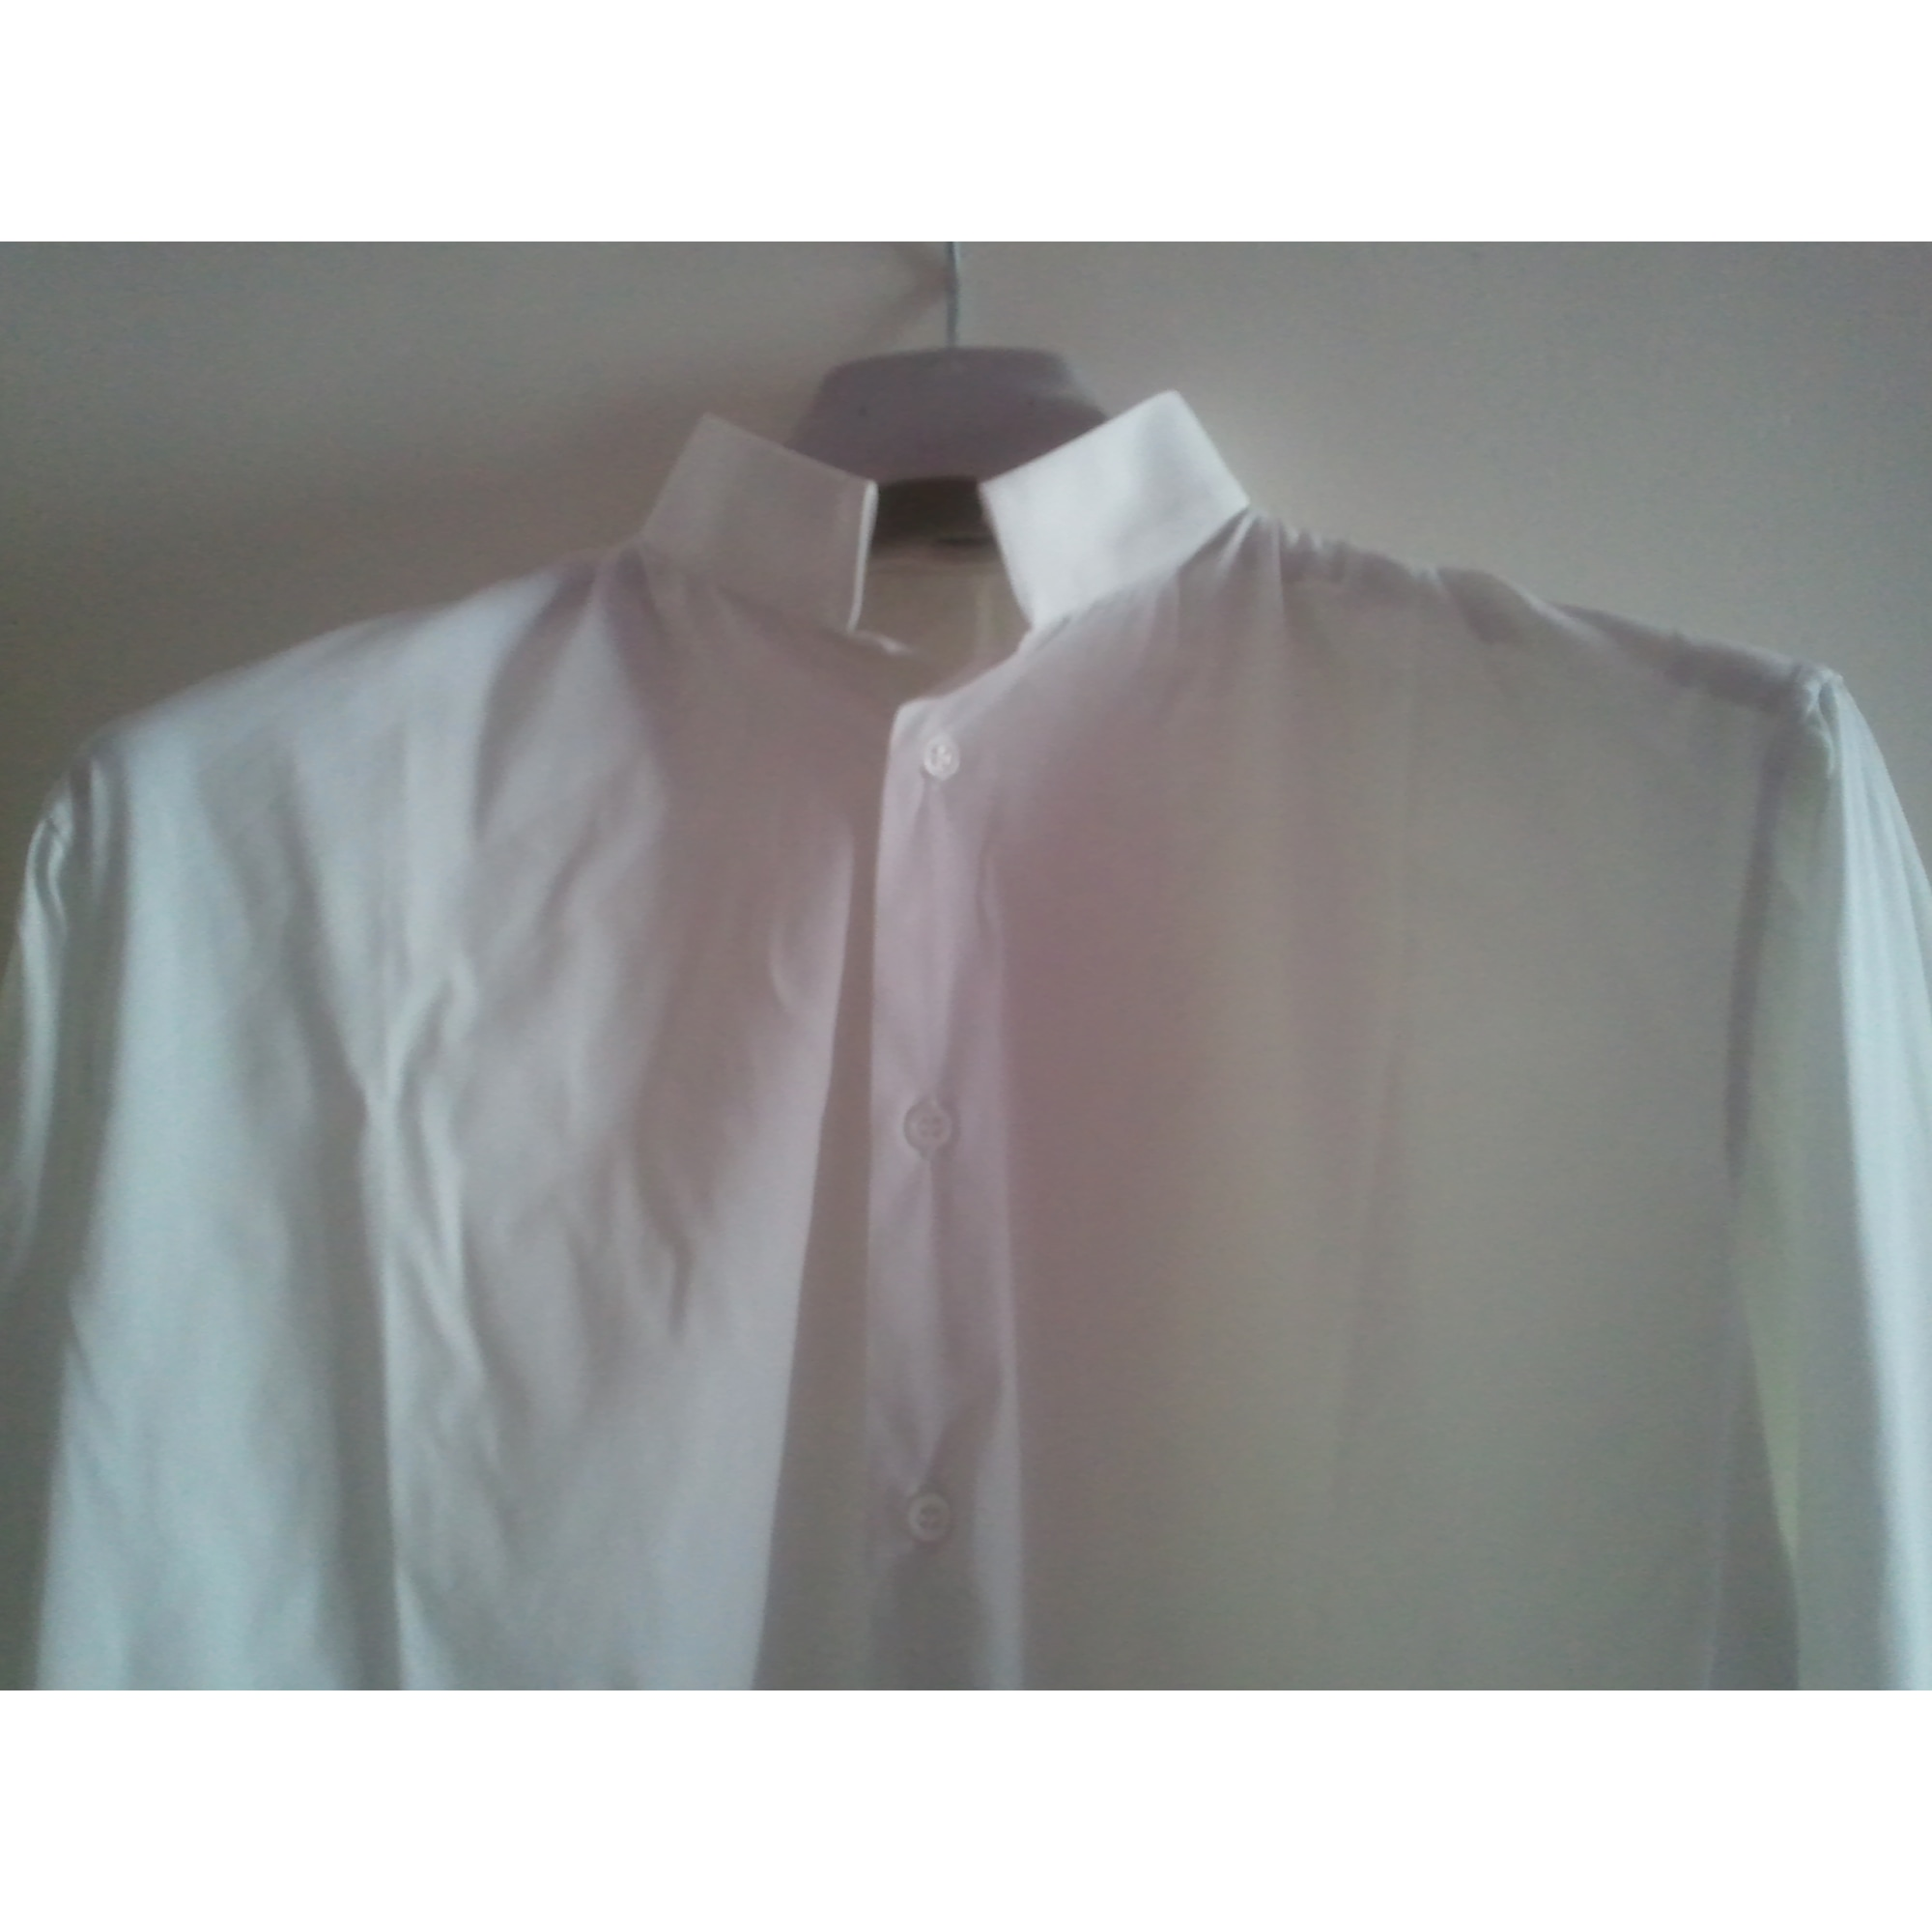 562f0f75c41e Chemise DIOR HOMME 39 40 (M) blanc vendu par Nelsymode - 245055